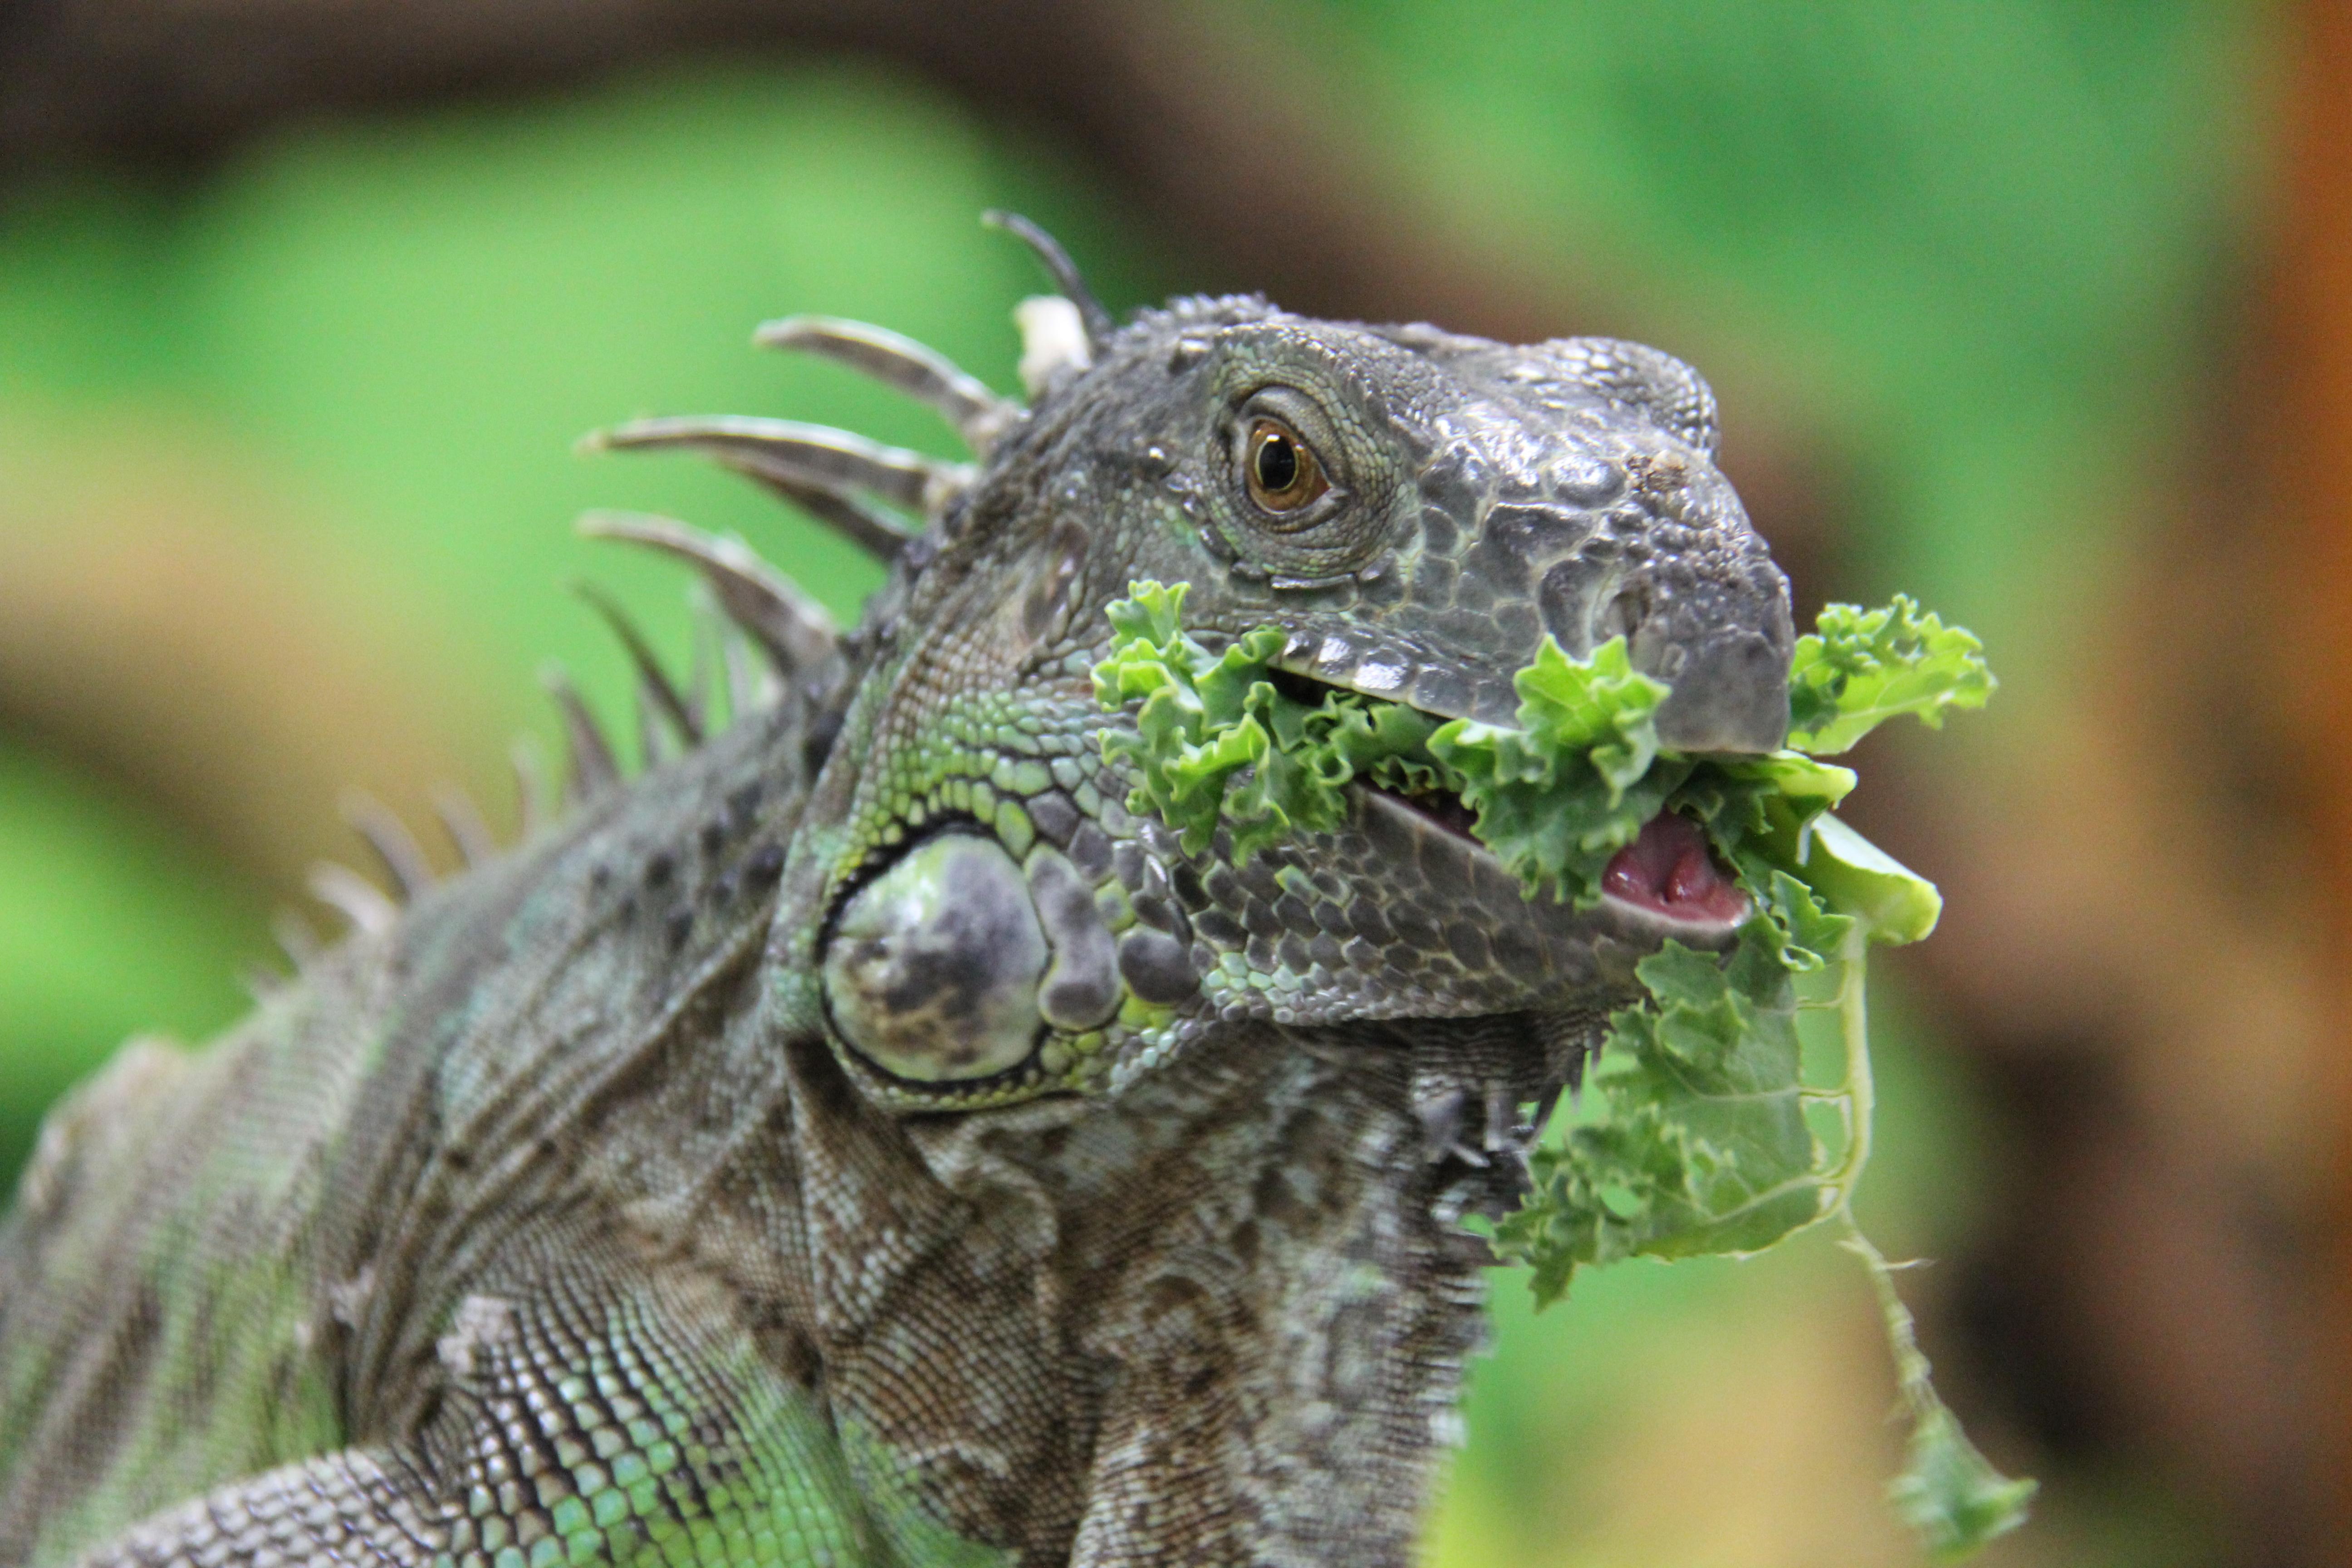 Chile - The Green Iguana | Taronga